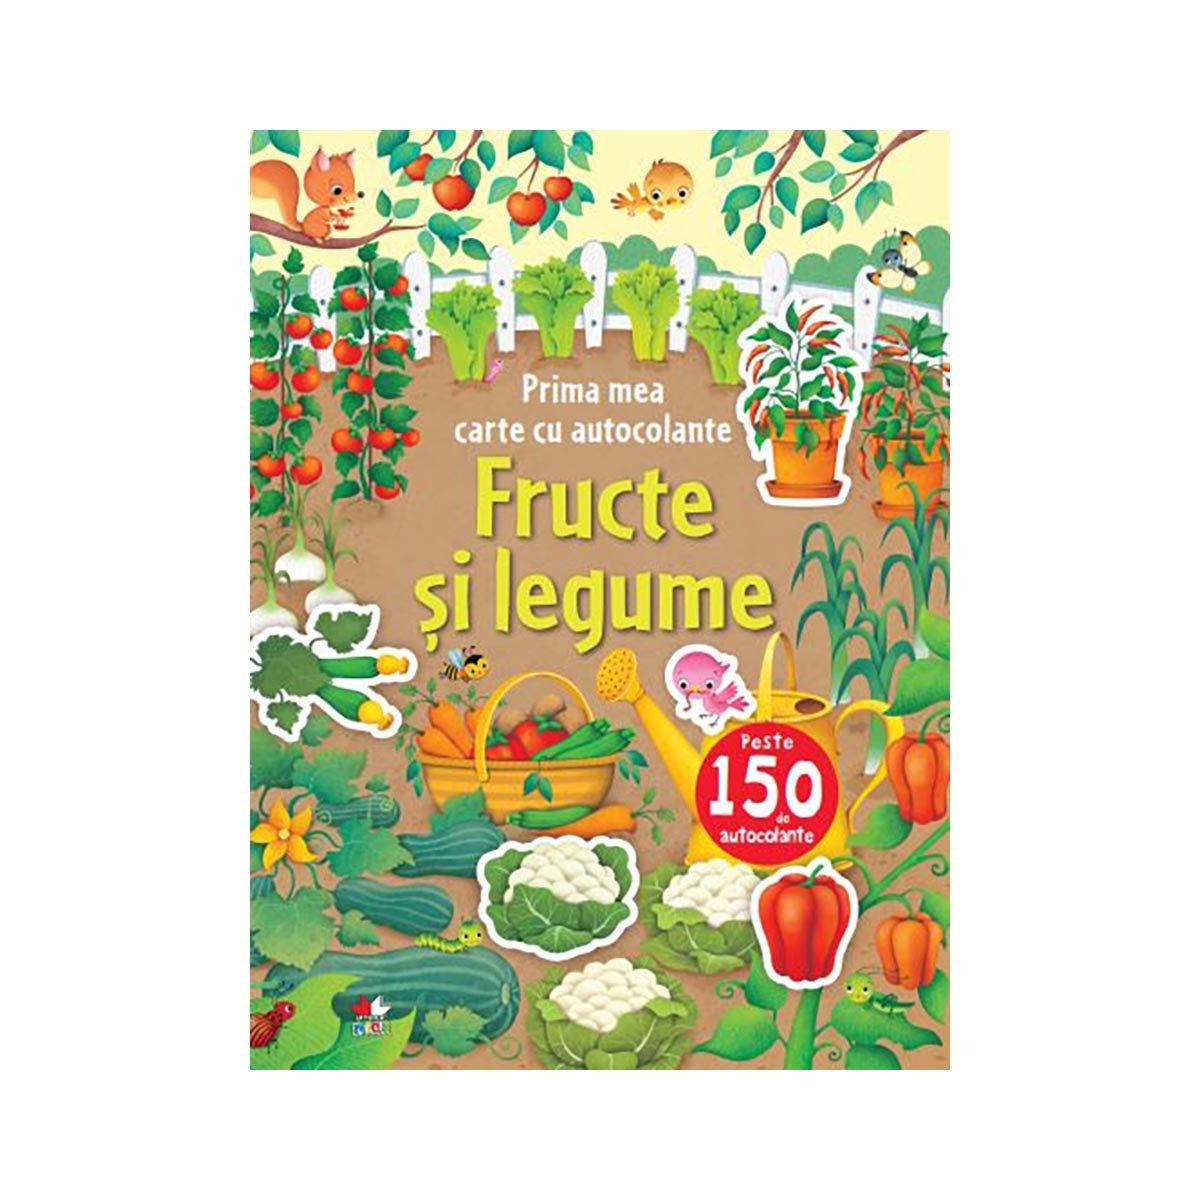 Carte cu autocolante Editura Litera, Fructe si legume